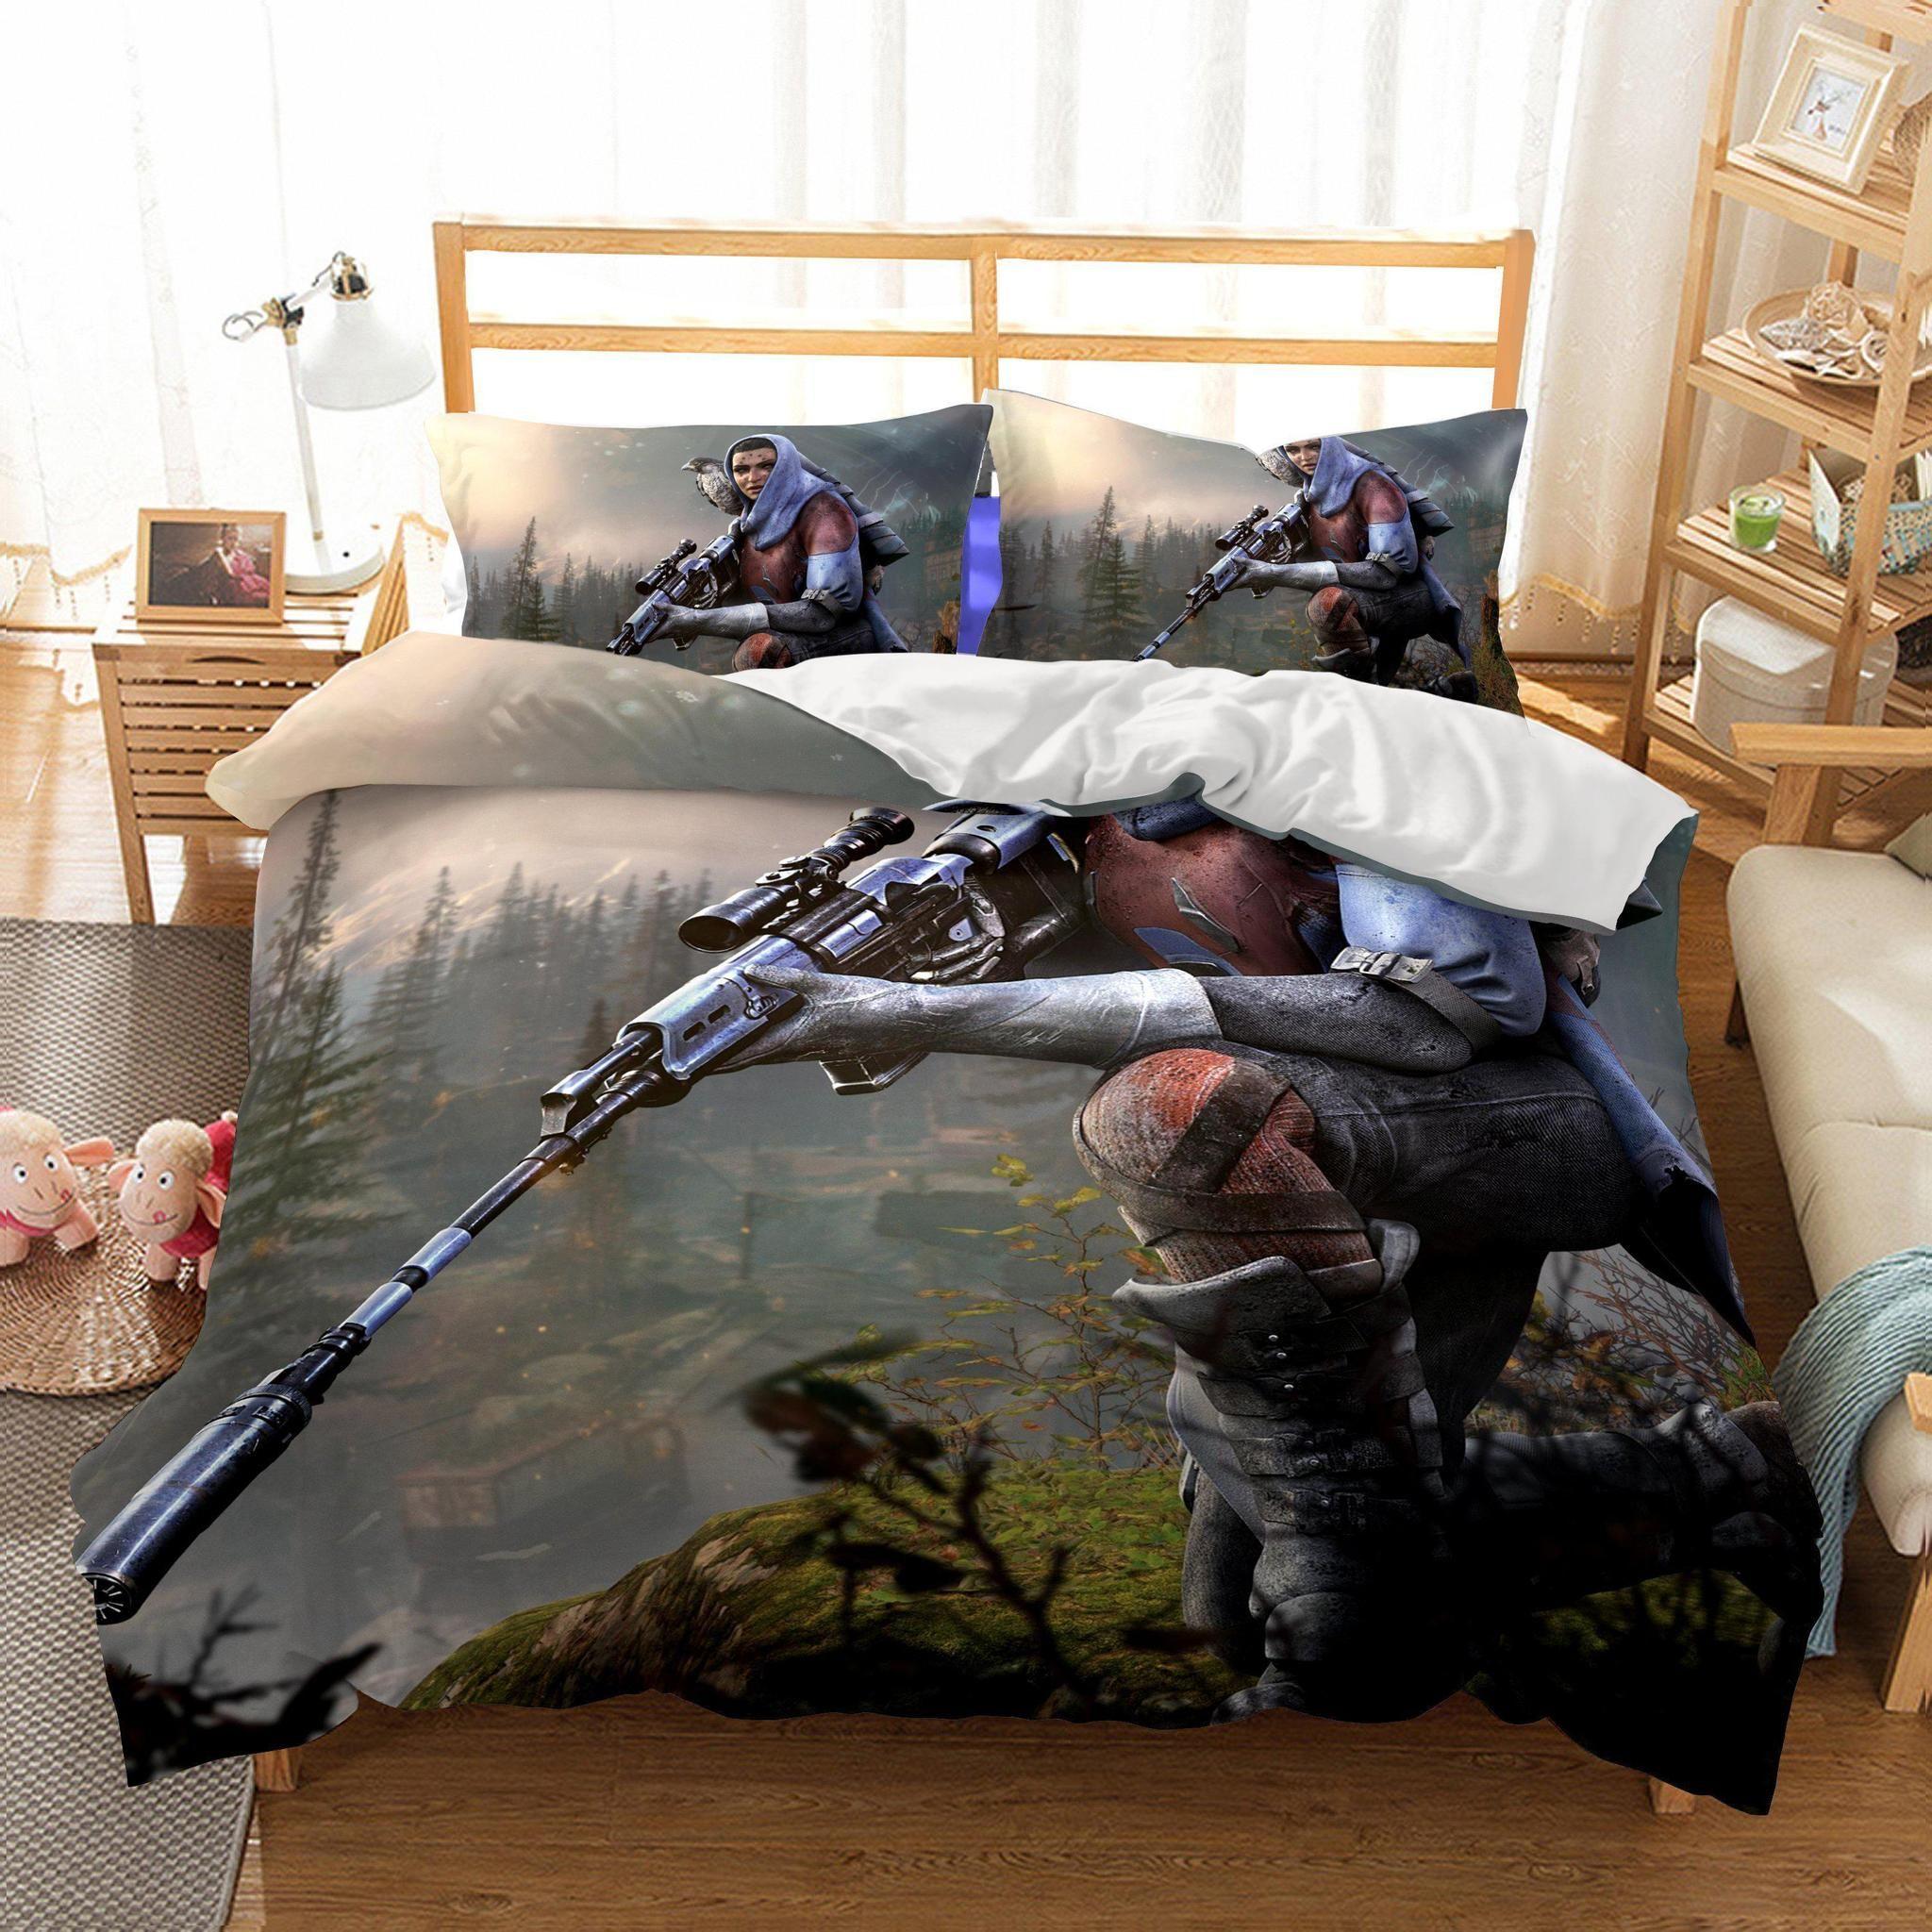 3d Bedding Wholesale Game Destiny2 Printed 1 Bedding Sets Duvet